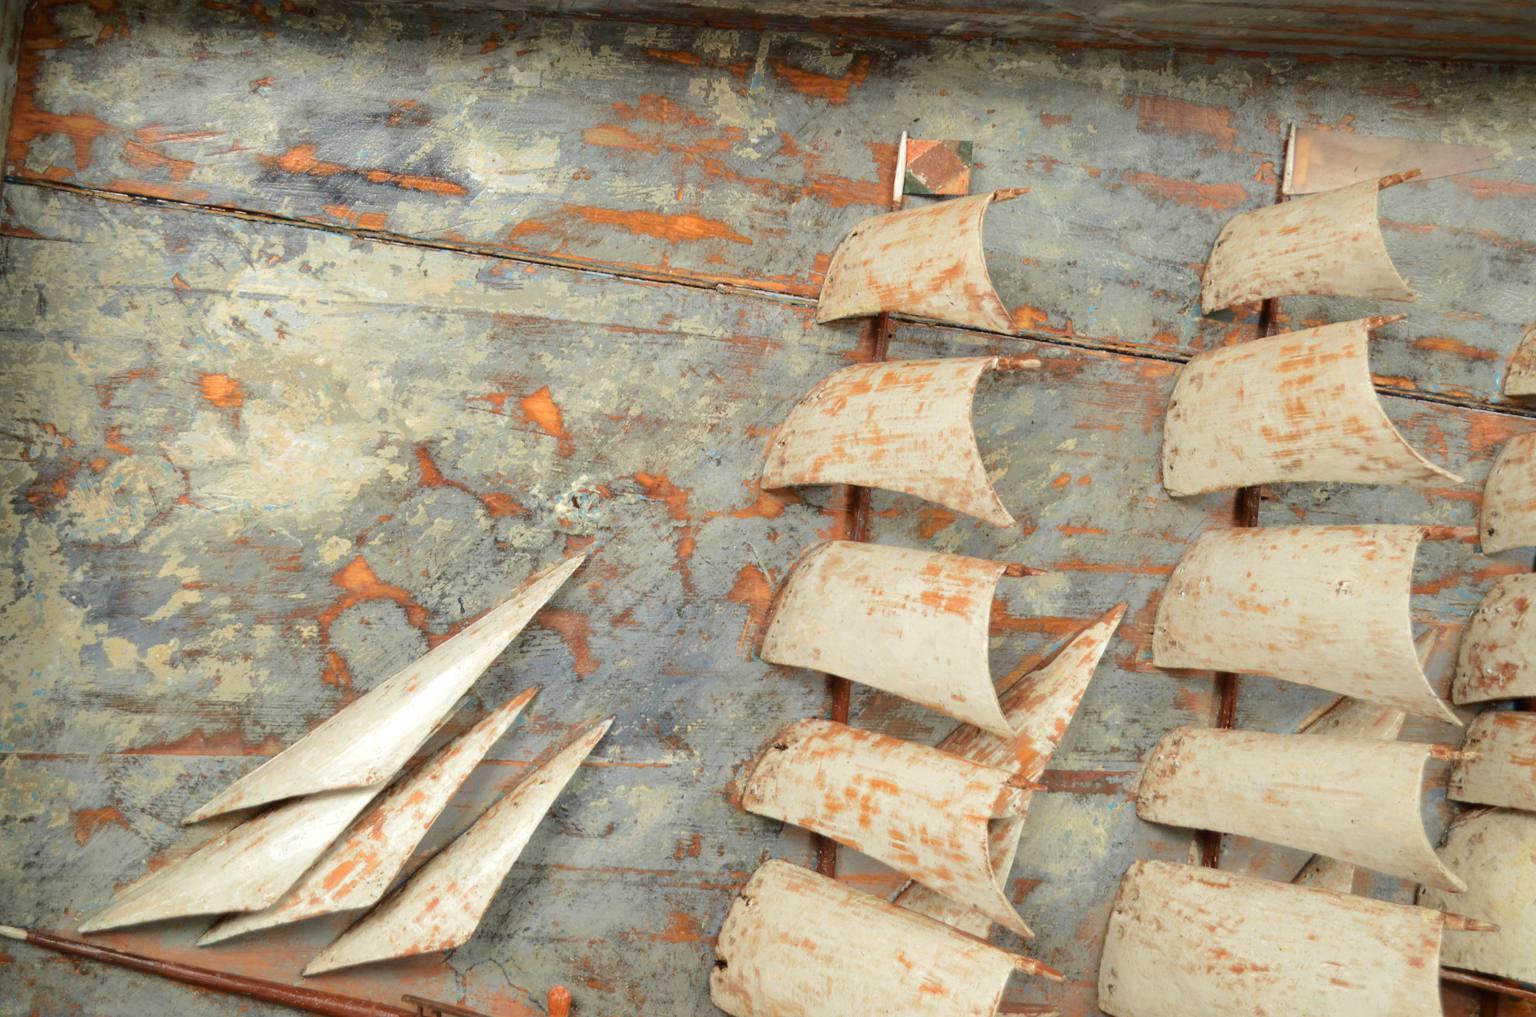 Modelli di navi d'epoca/6328-Diorama nautico